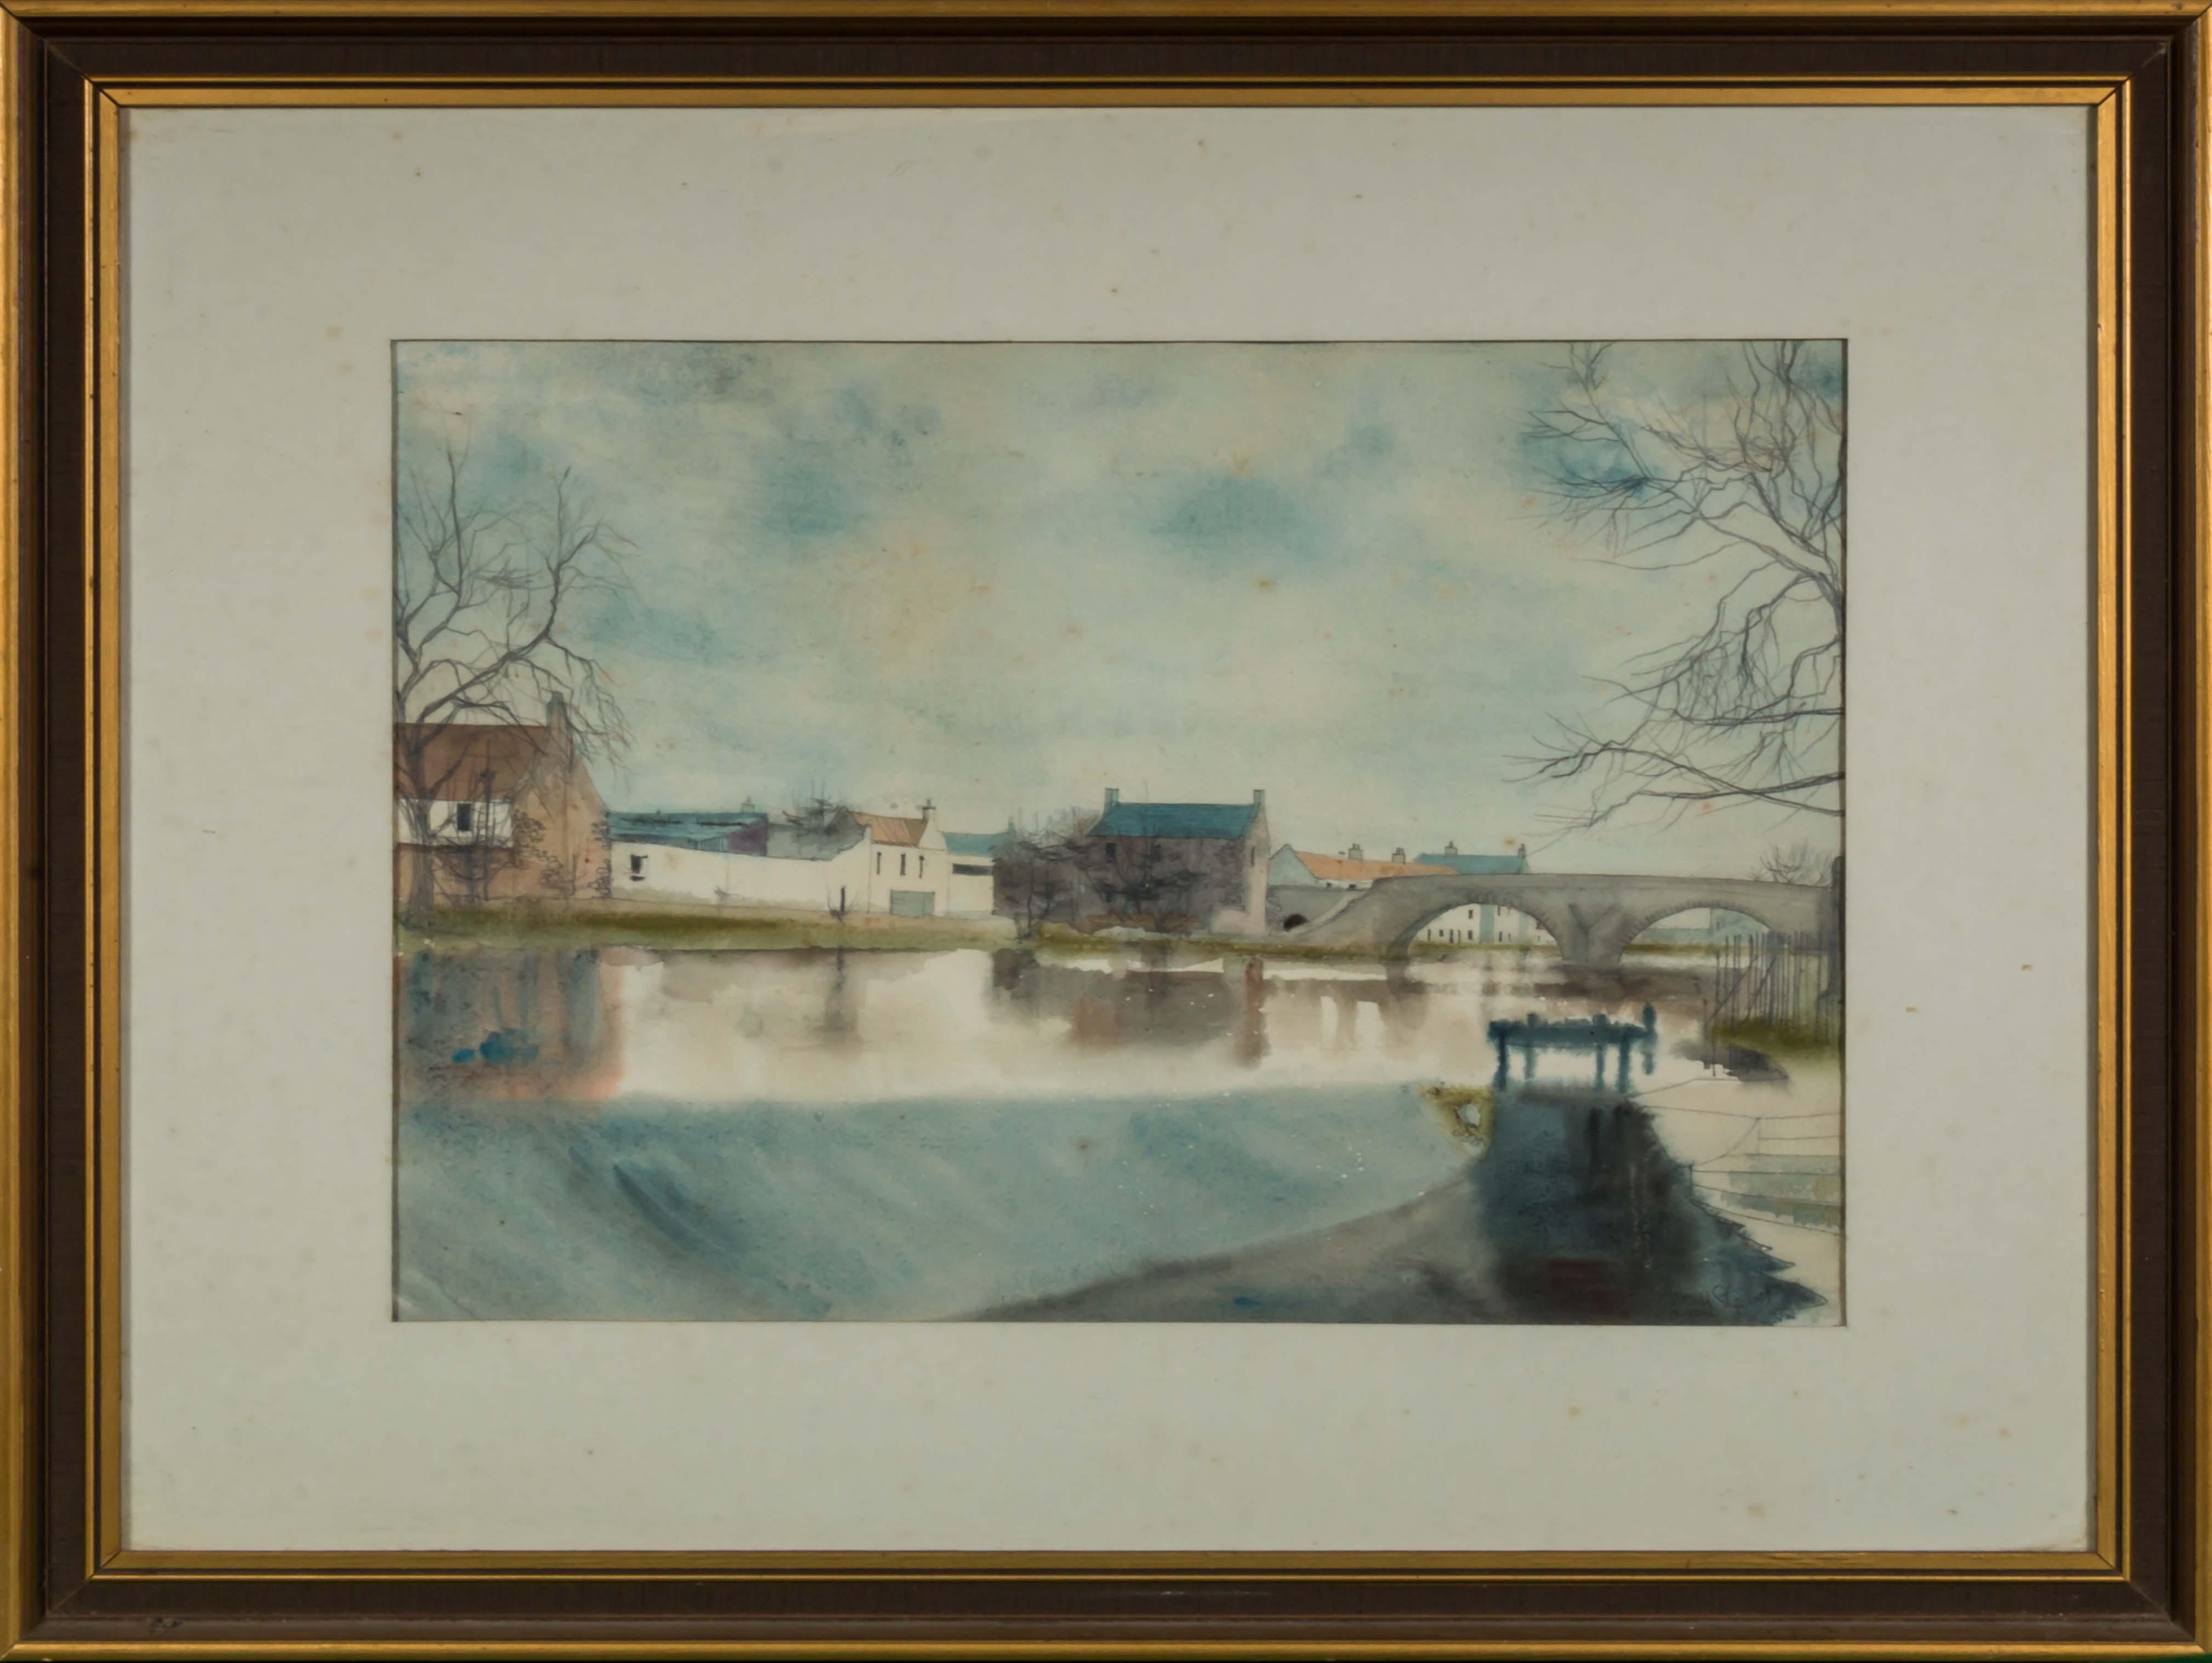 Lot 42 - A framed watercolour depicting a river scene, image size 32.5 cm x 43 cm